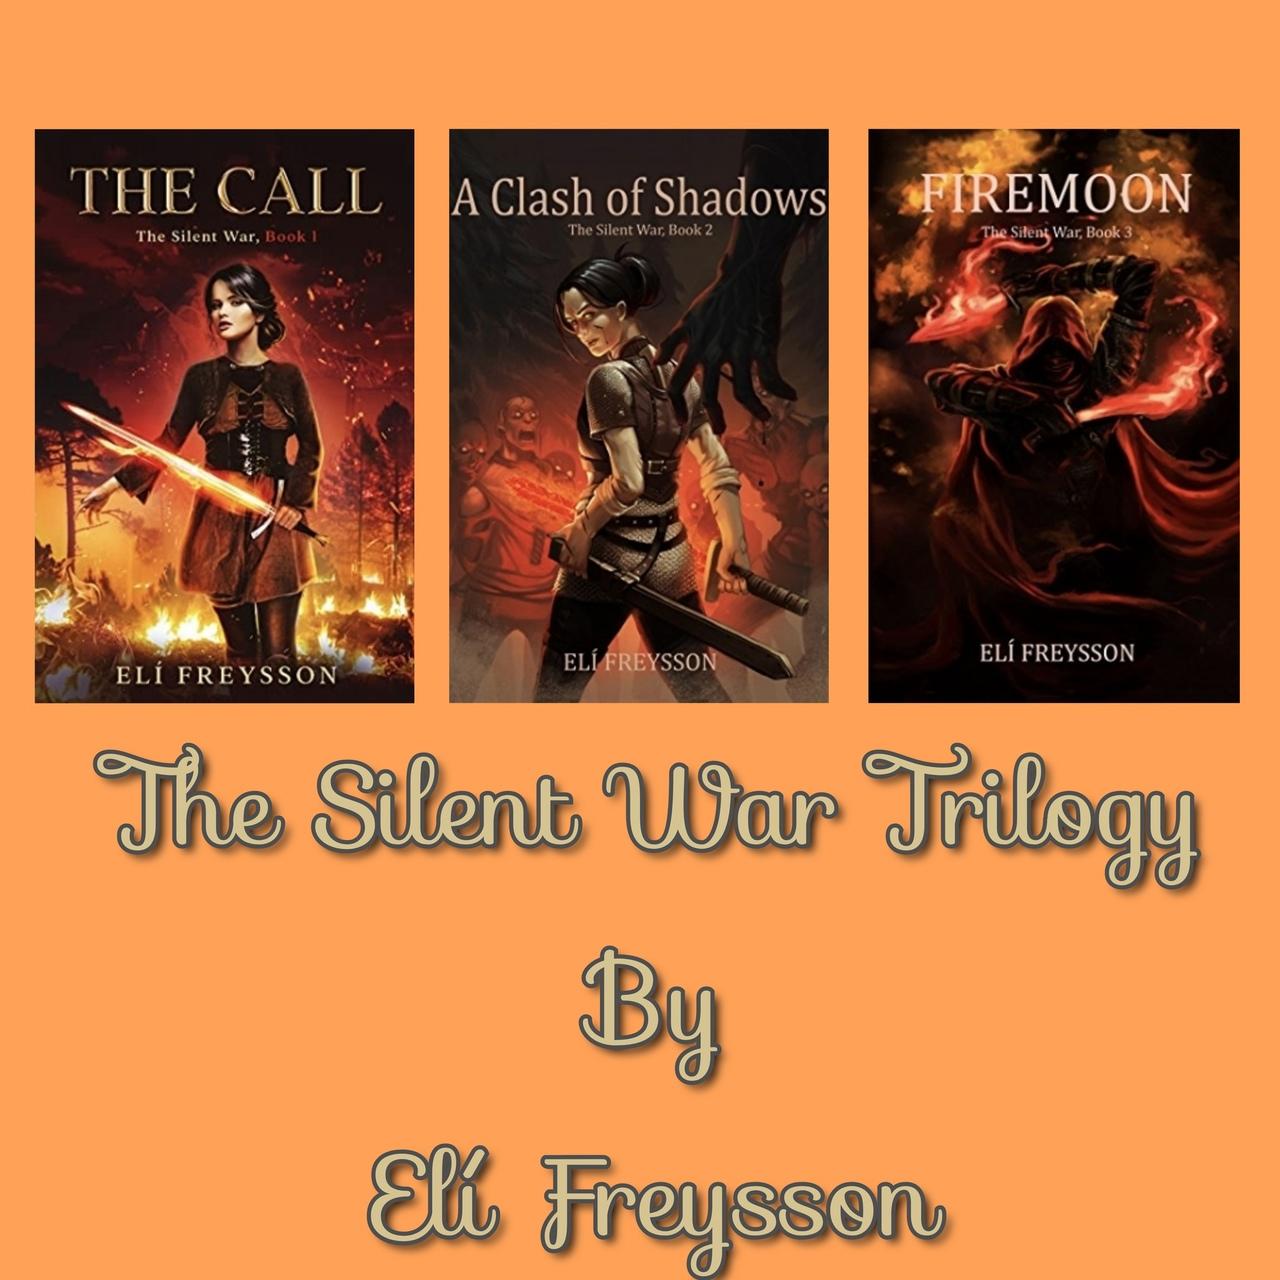 The Silent War Trilogy by Elí Freysson.